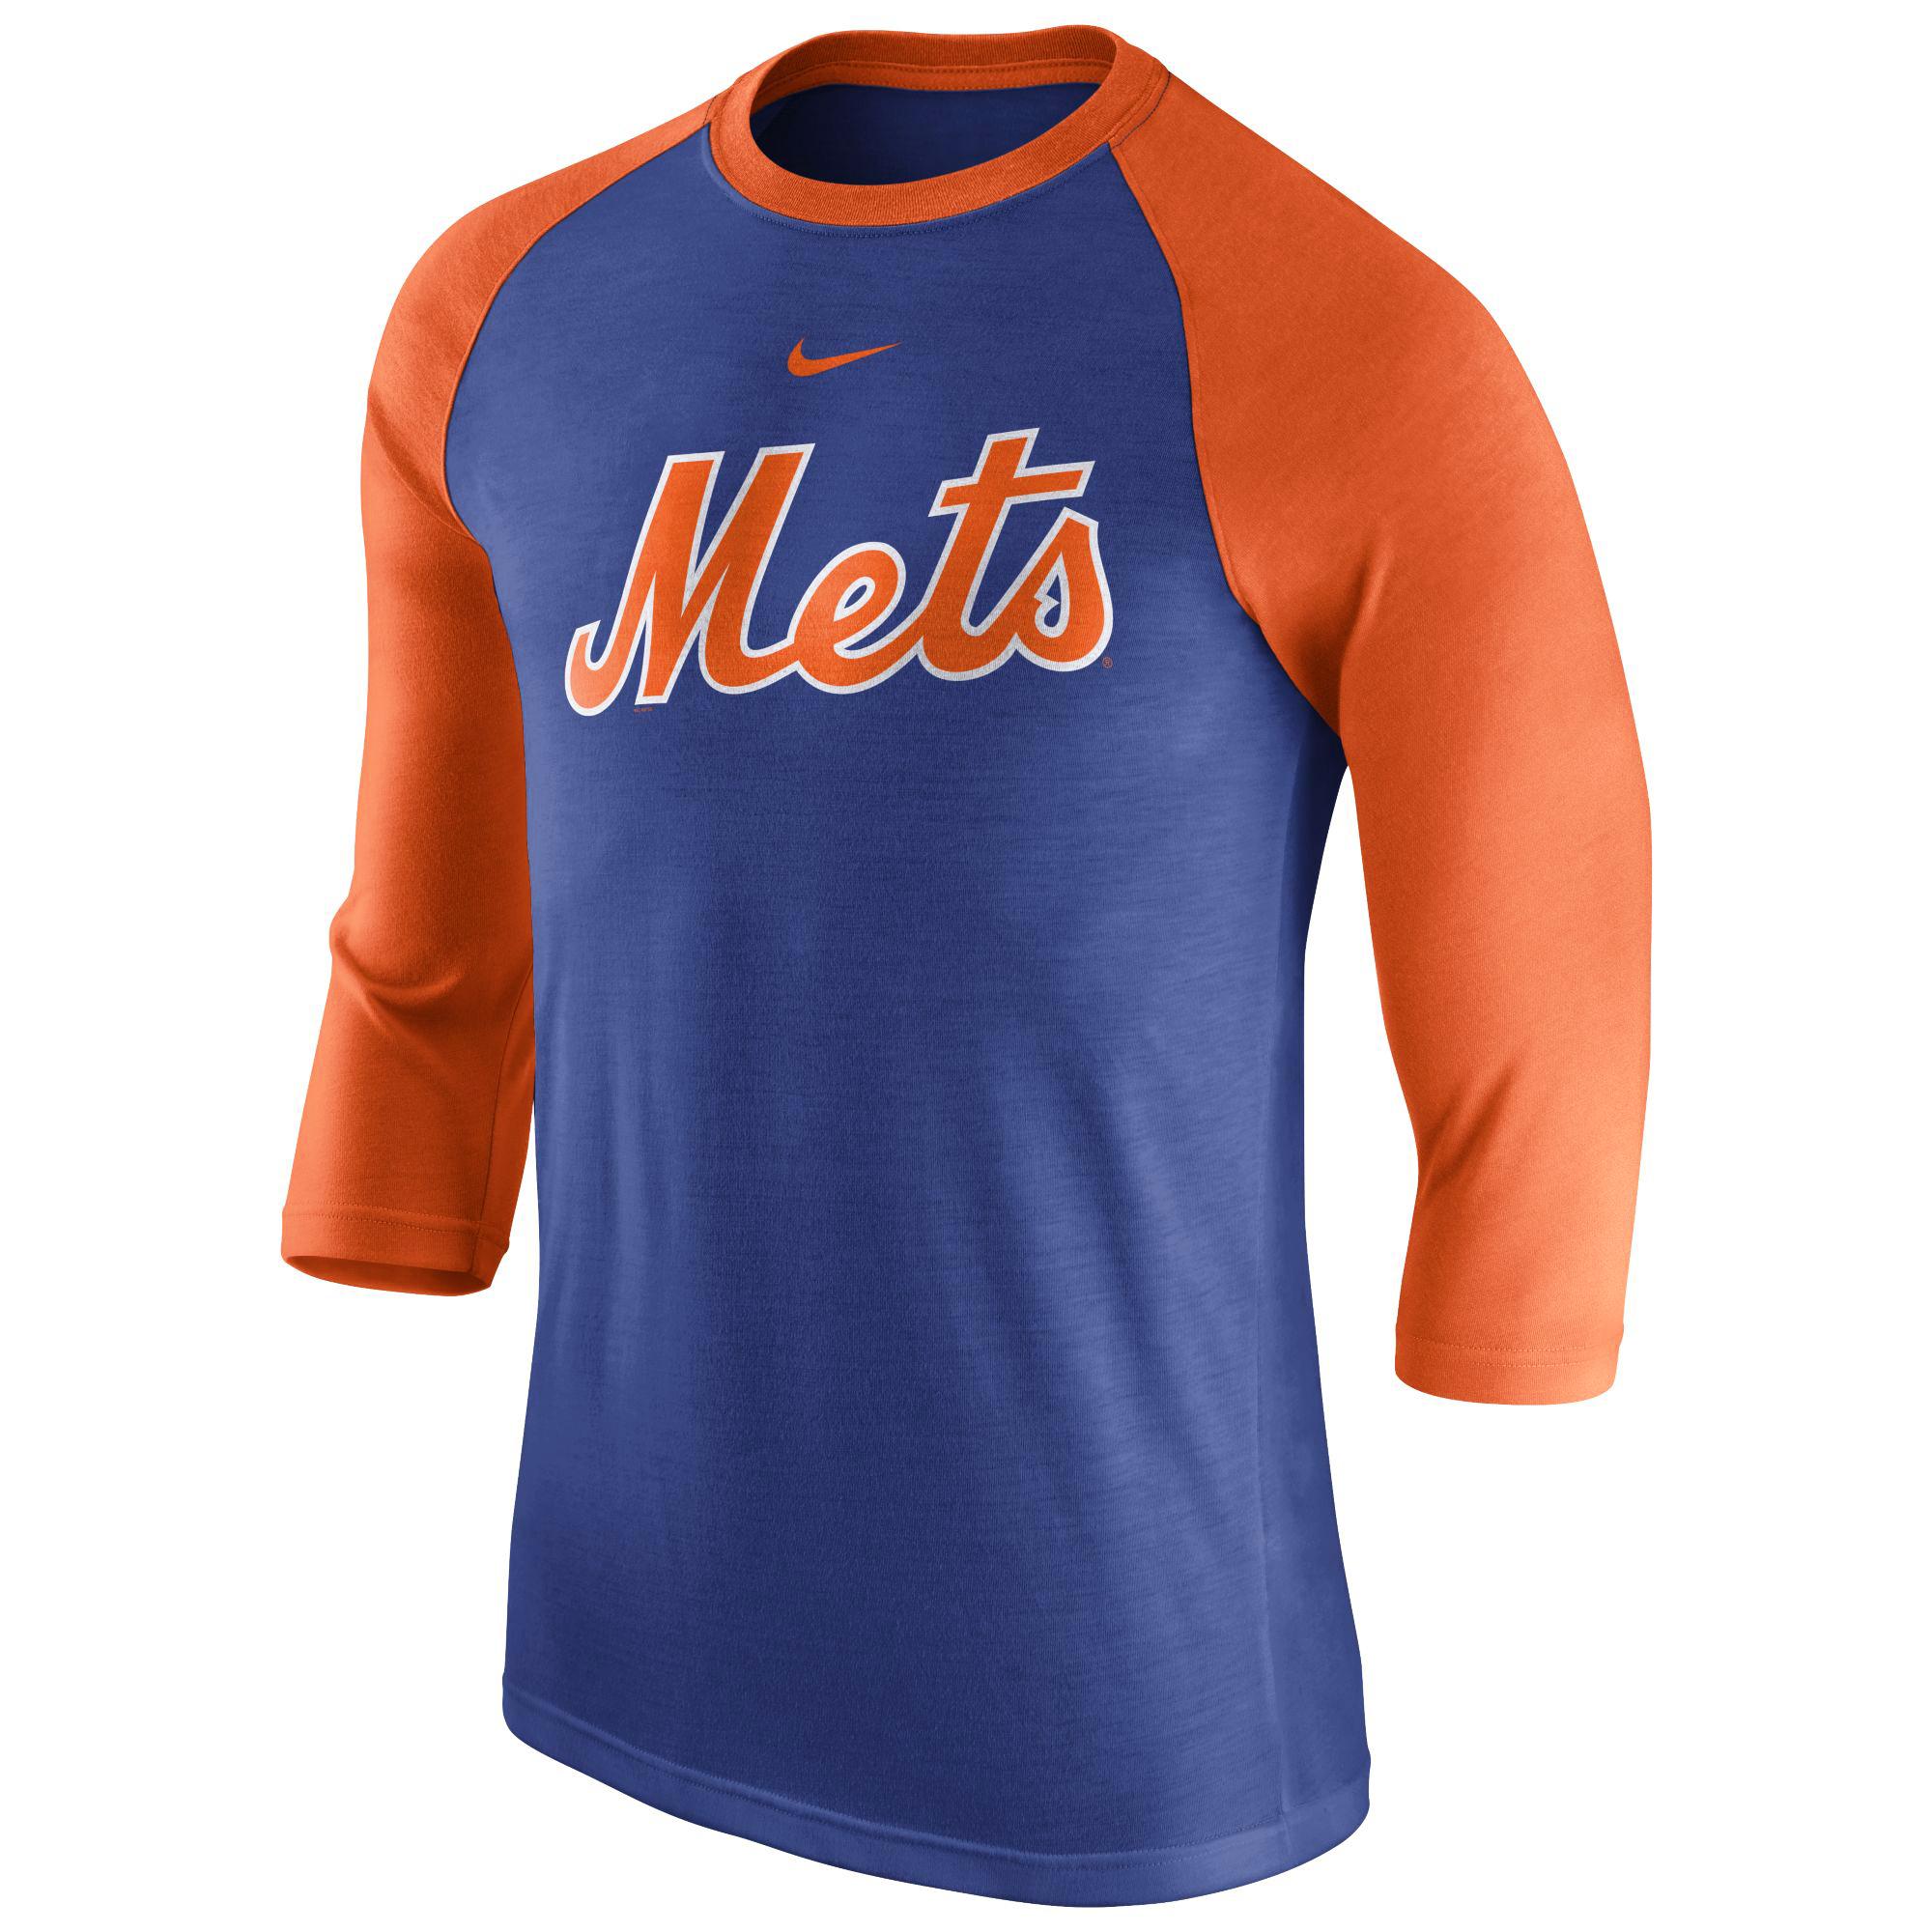 Men's Nike Royal New York Mets Wordmark Three-Quarter Sleeve Tri-Blend Raglan T-Shirt